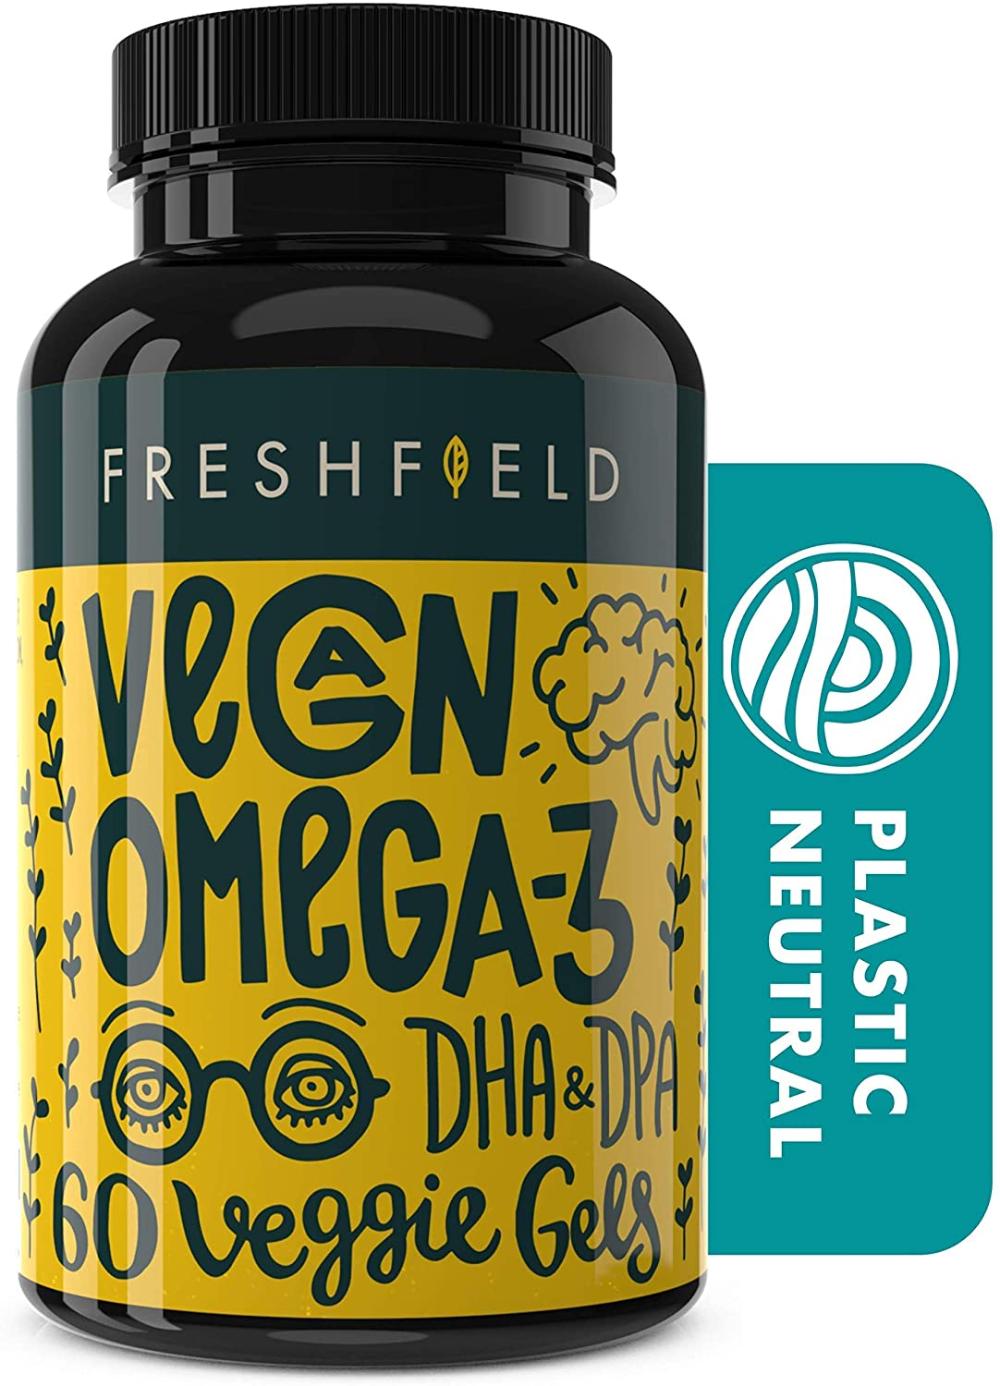 Amazon Com Freshfield Vegan Omega 3 Dha Supplement 2 Month Supply Premium Algae Oil Plant Based Sustainable Mer In 2020 Vegan Vitamins Supplements Dha Supplement